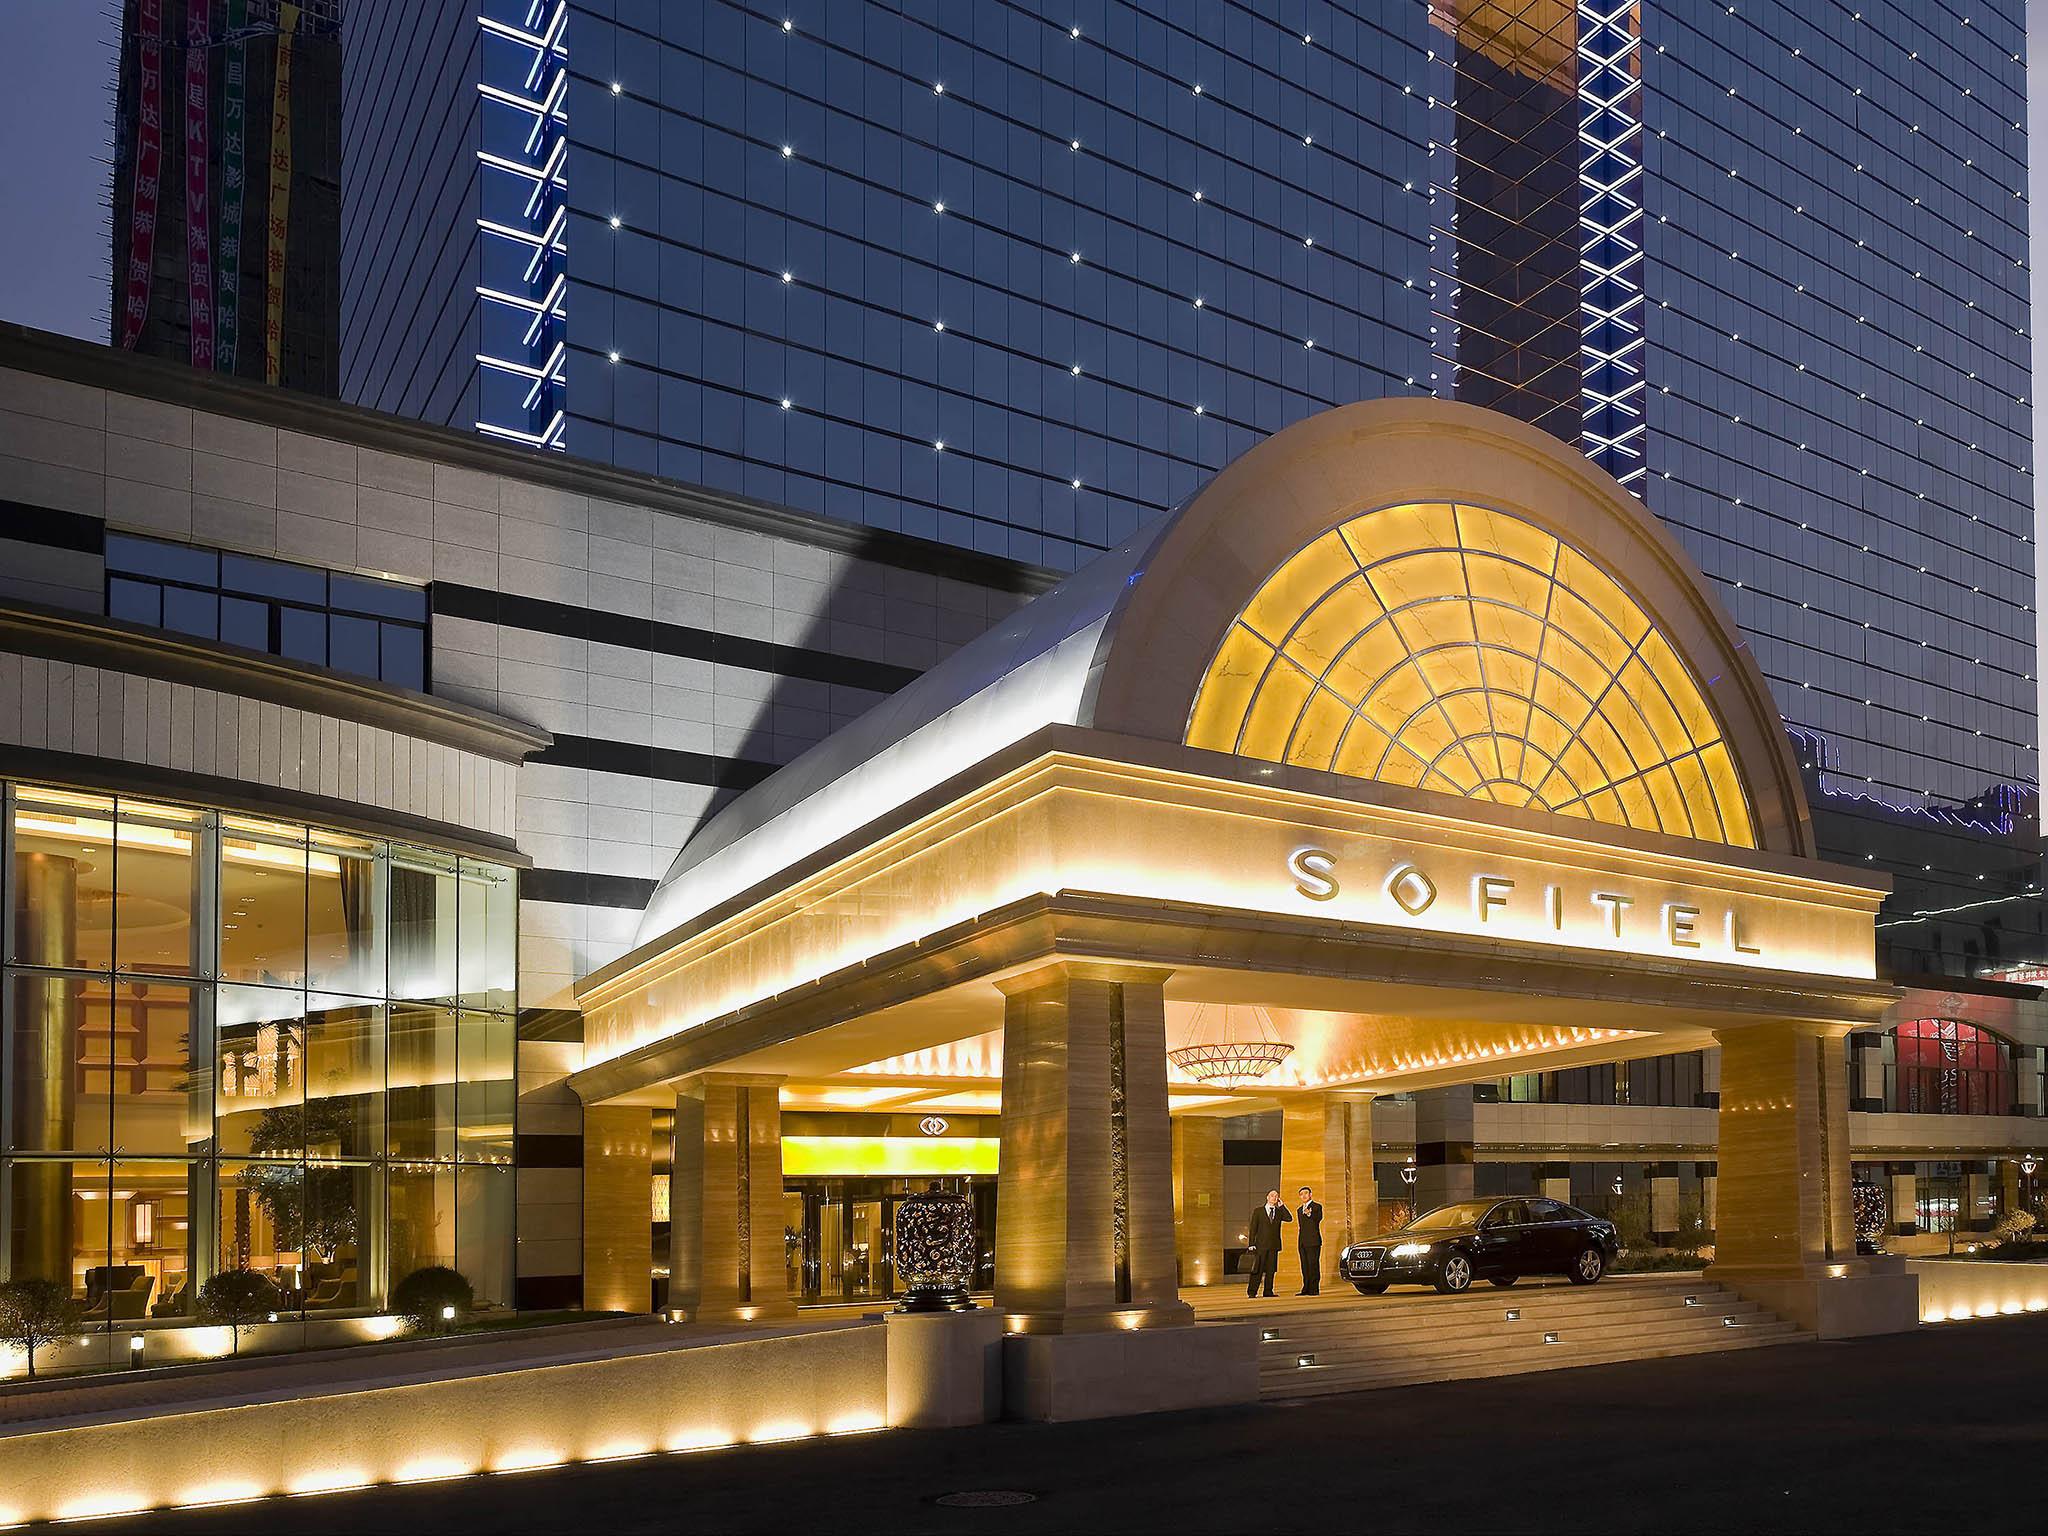 Hotell – Sofitel Harbin